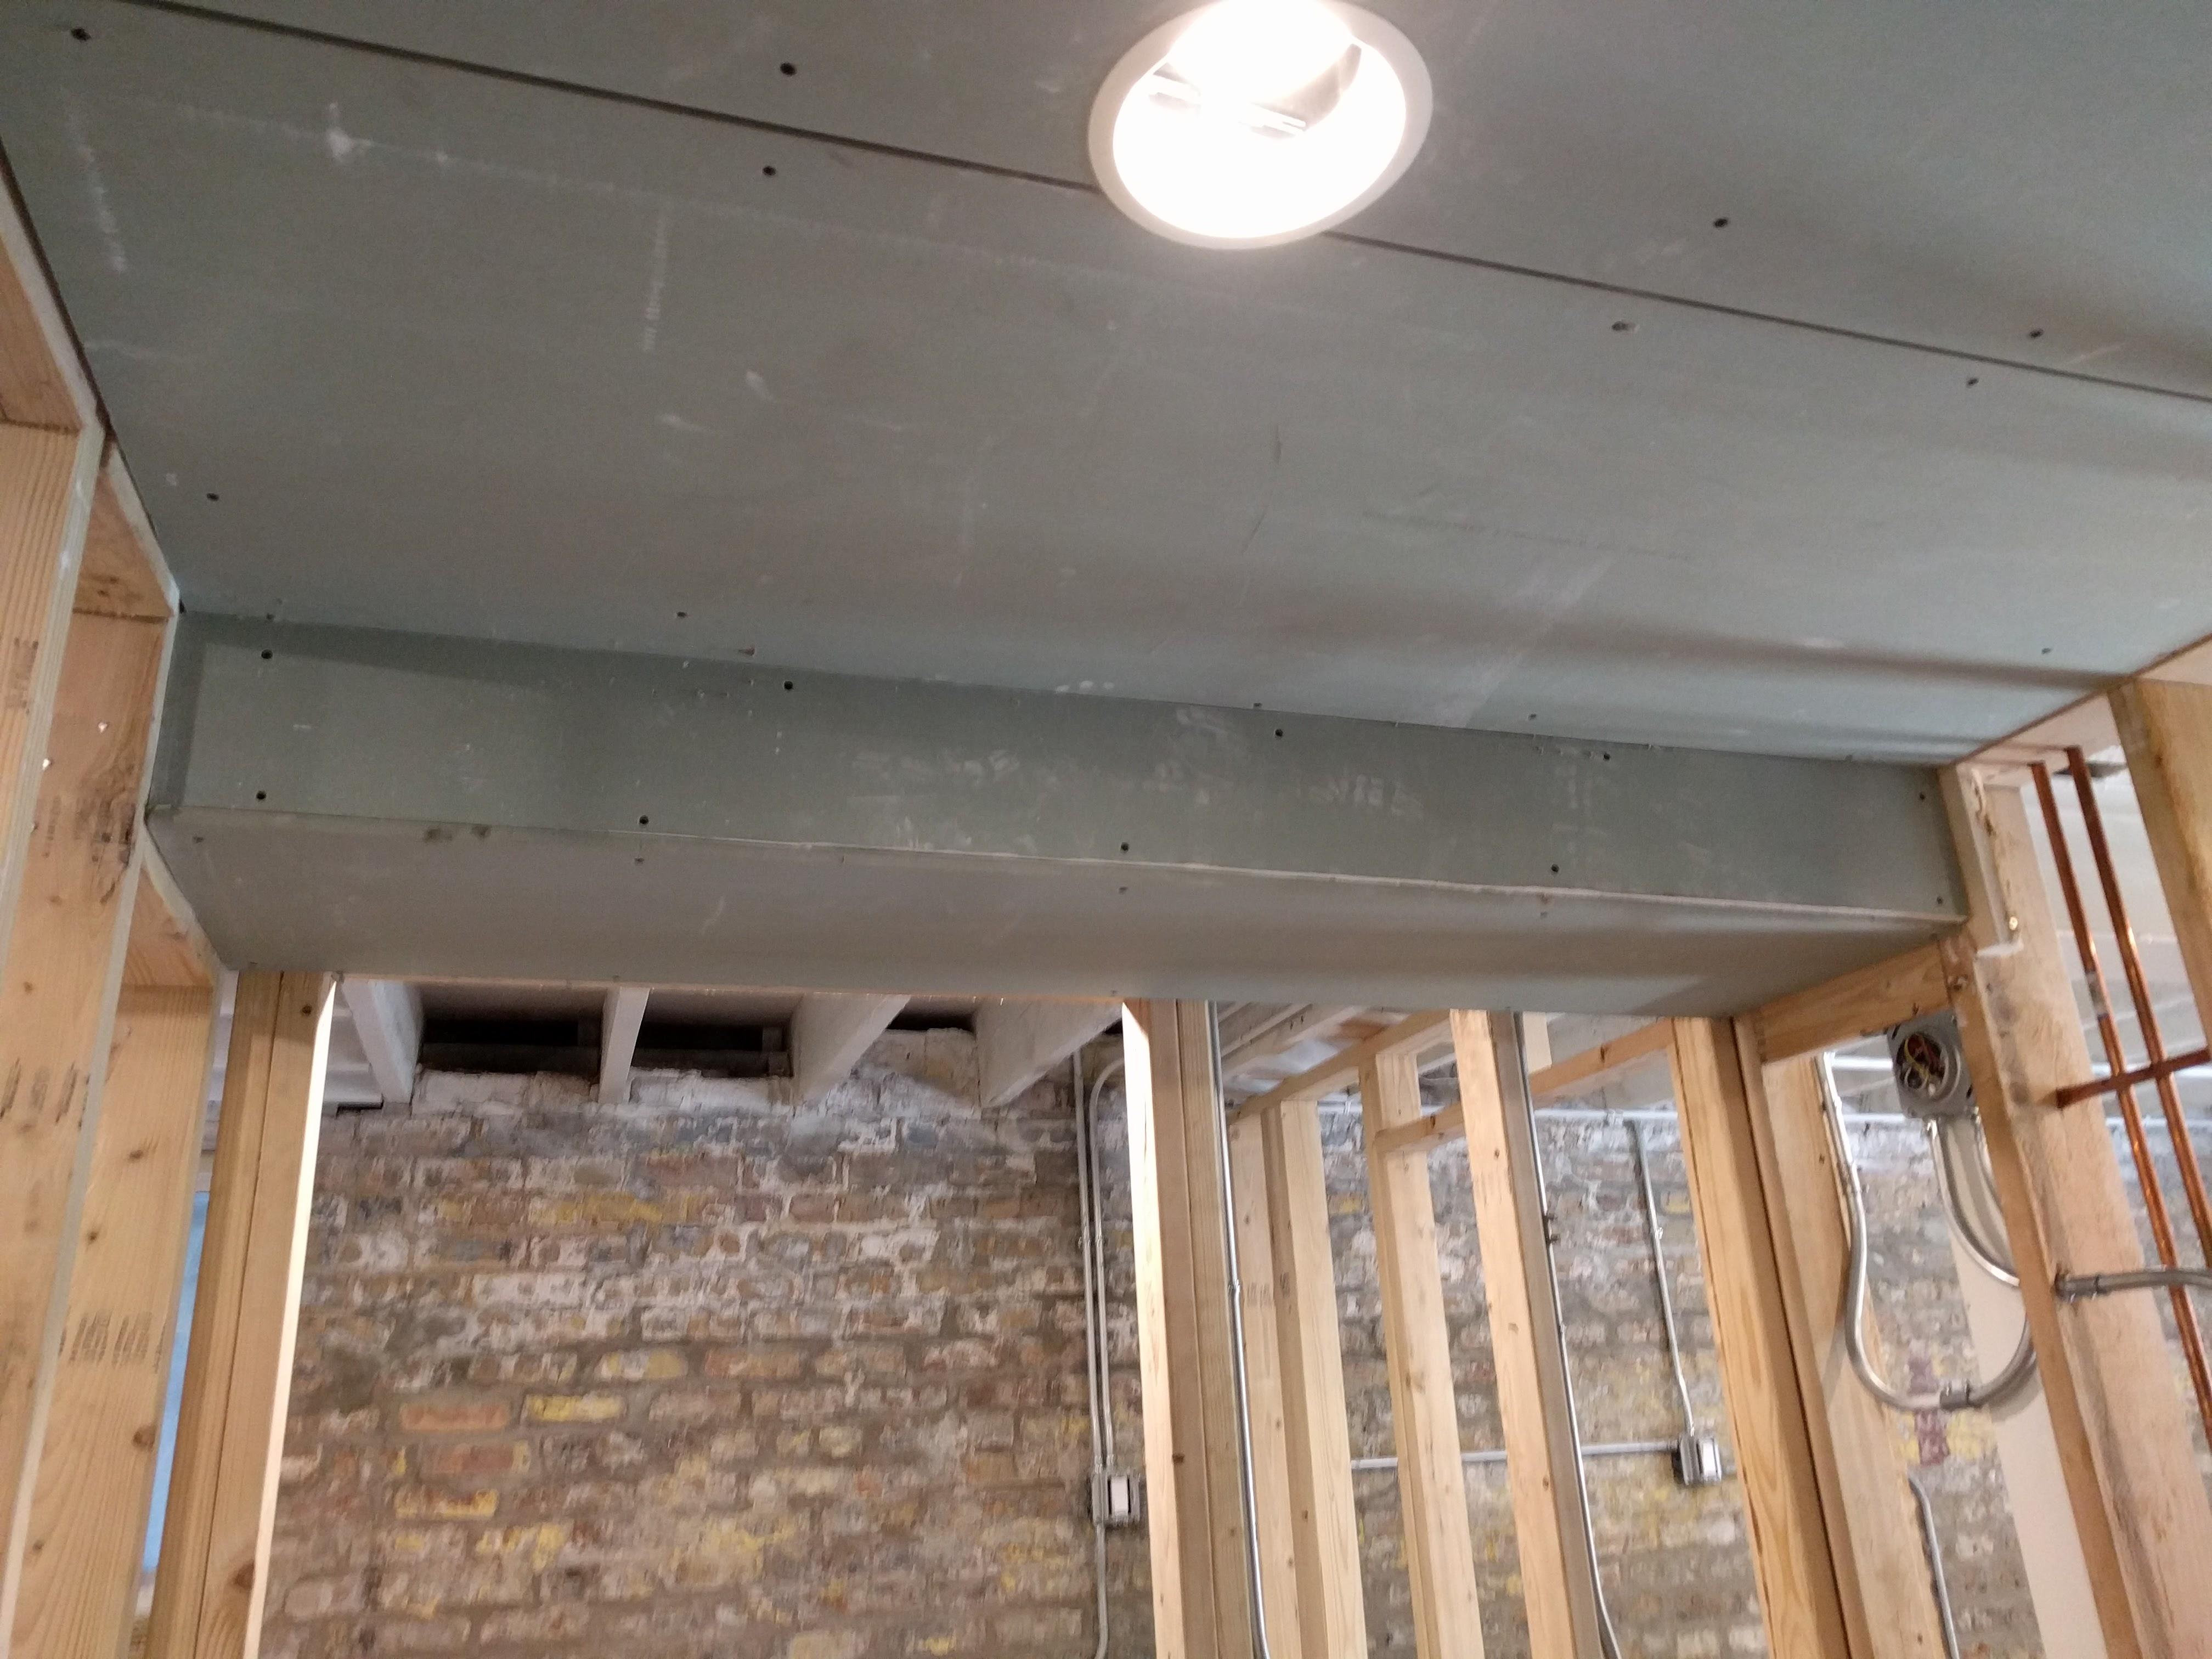 Bulkhead Drywall Two Flat Remade